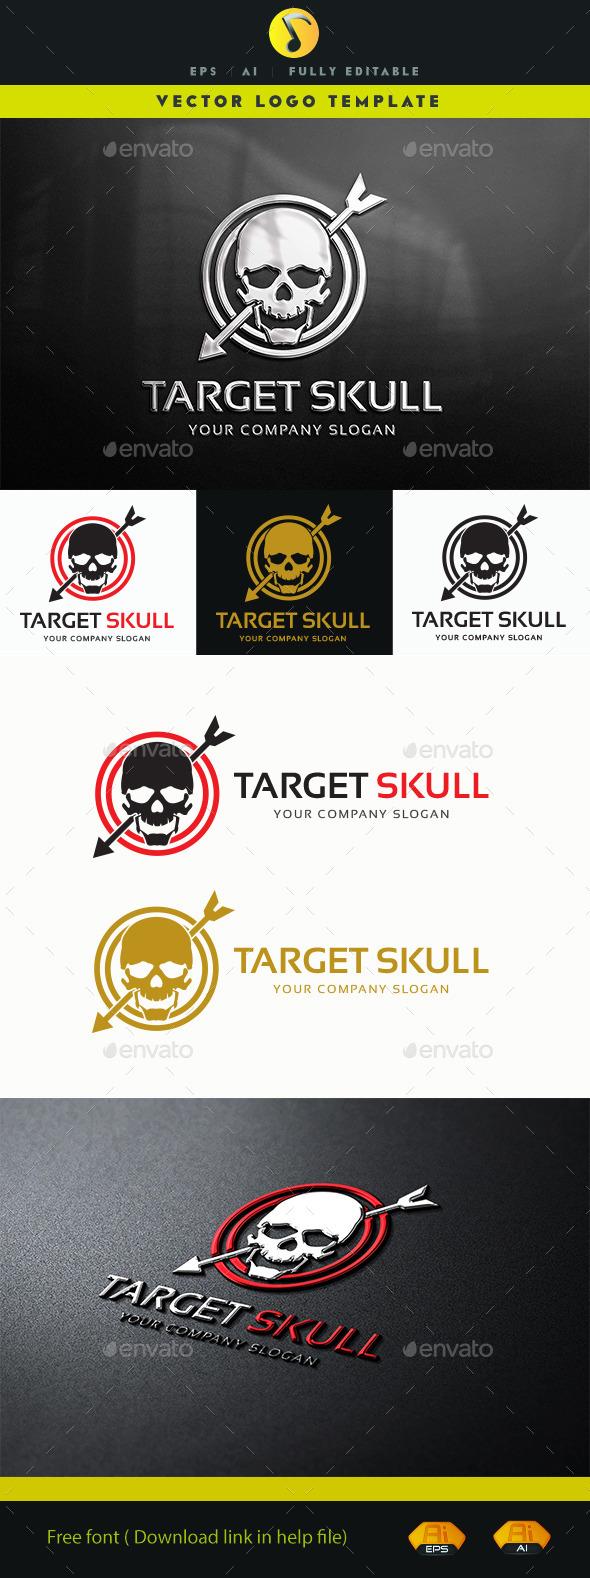 Target Skull Logo